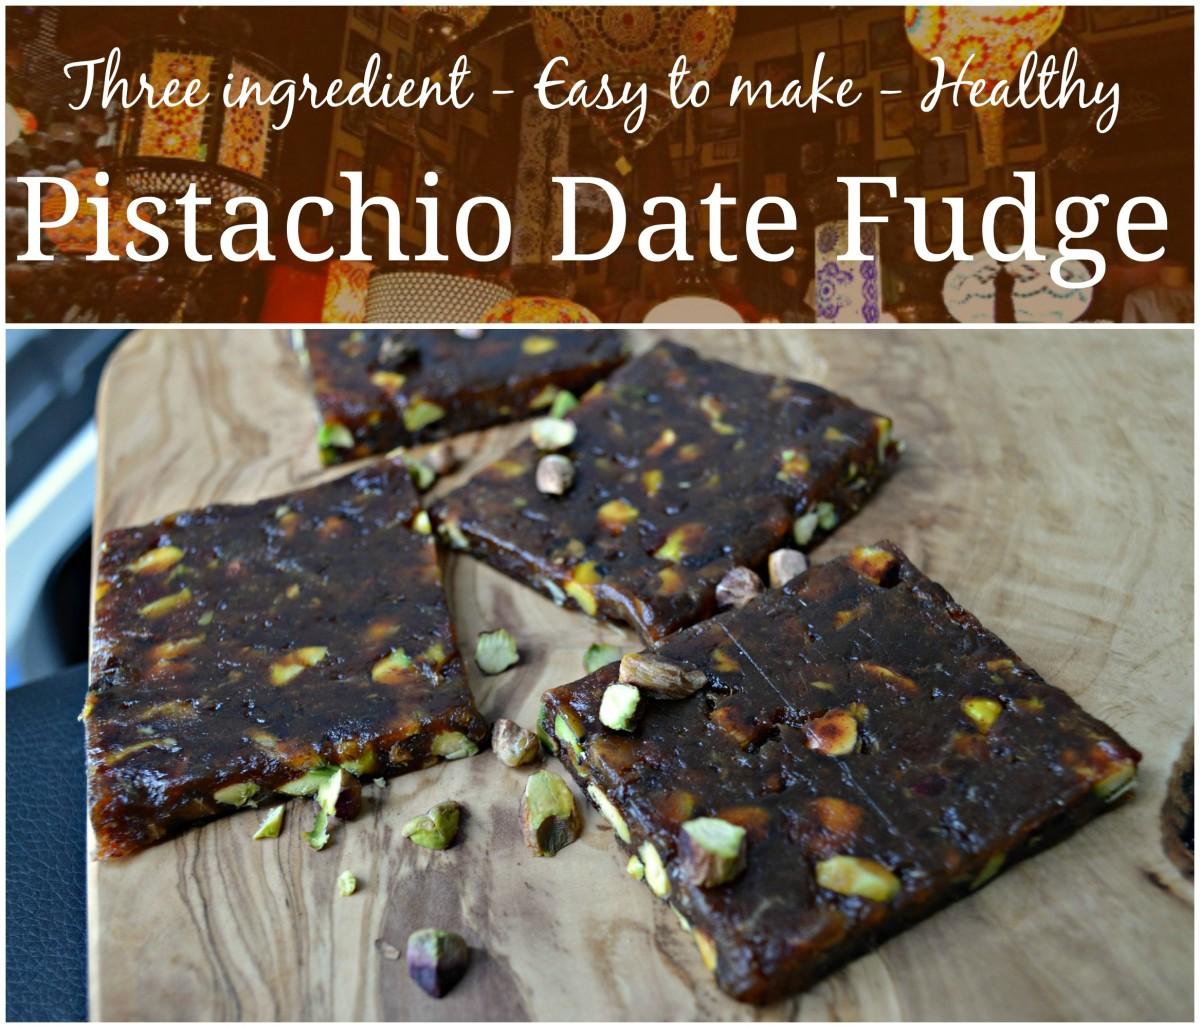 Healthy Dessert Recipe: Pistachio Date Fudge